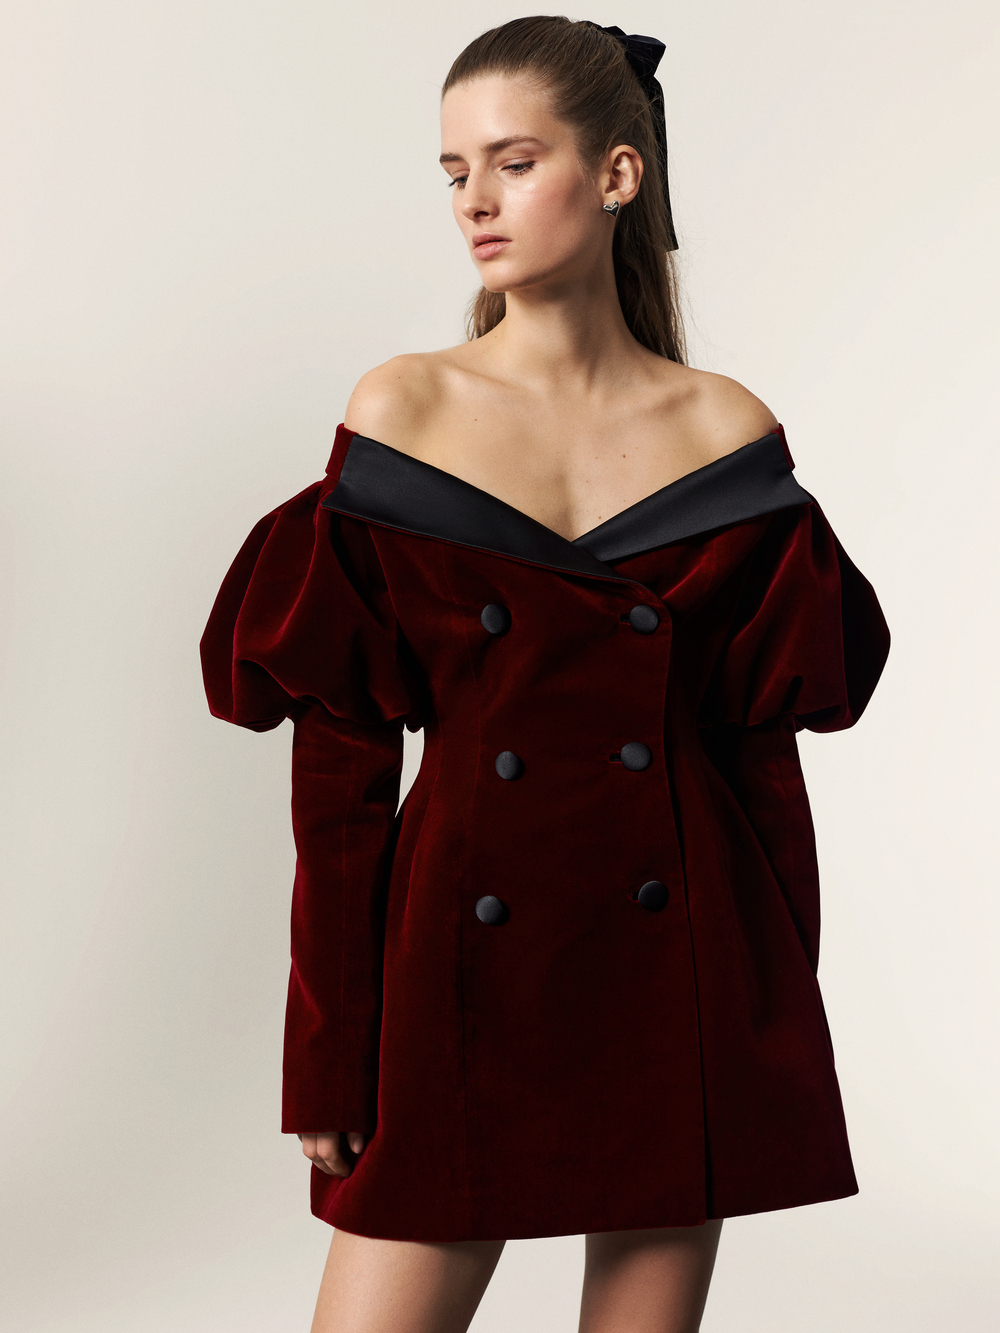 В стиле Жаклин Кеннеди: Украинский бренд Marianna Senchina презентовал коллекцию Fall-Winter 21/22-Фото 6